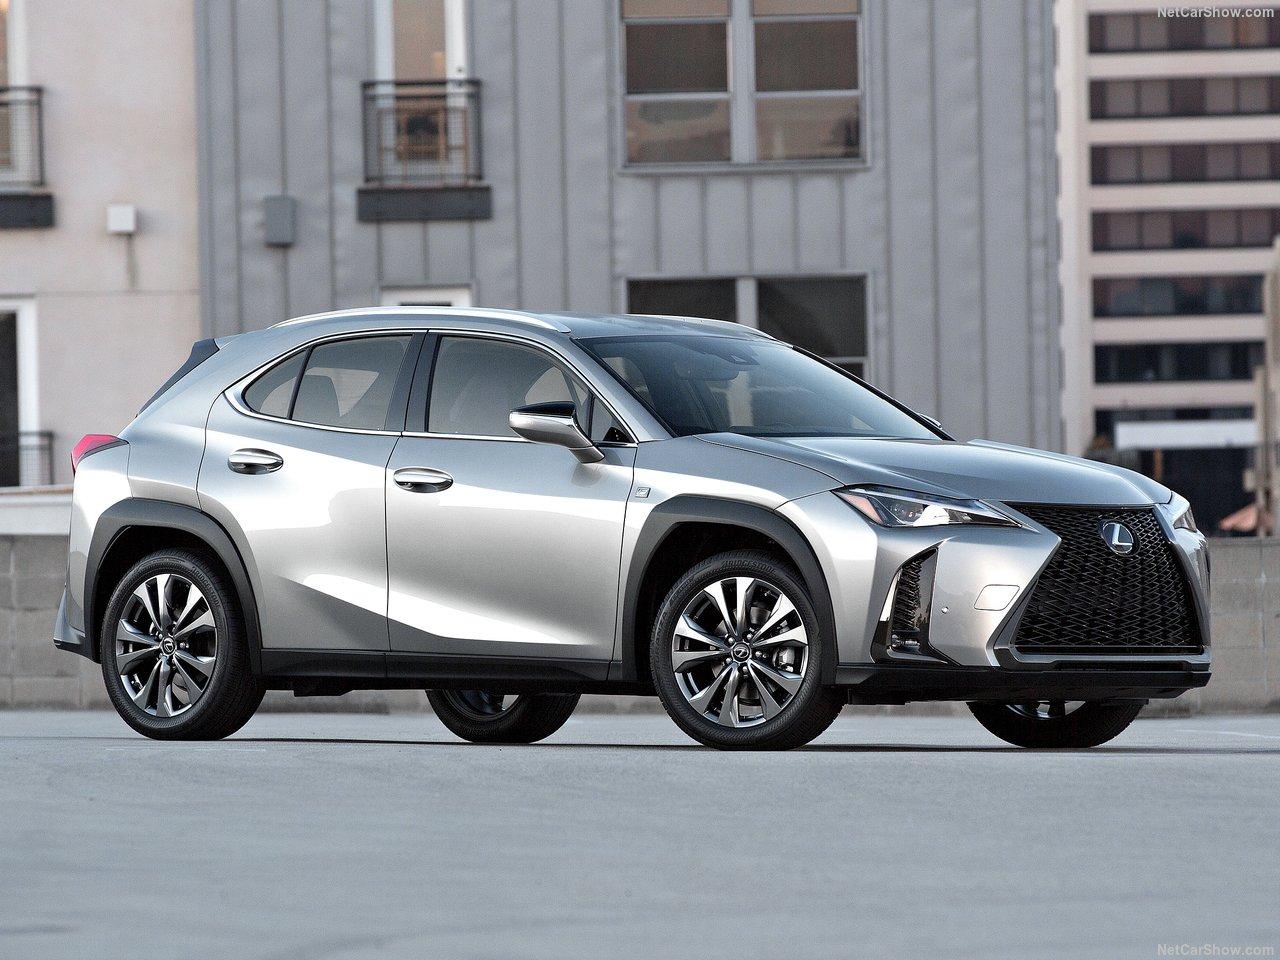 Lexus-UX-2019-1280-03.jpg